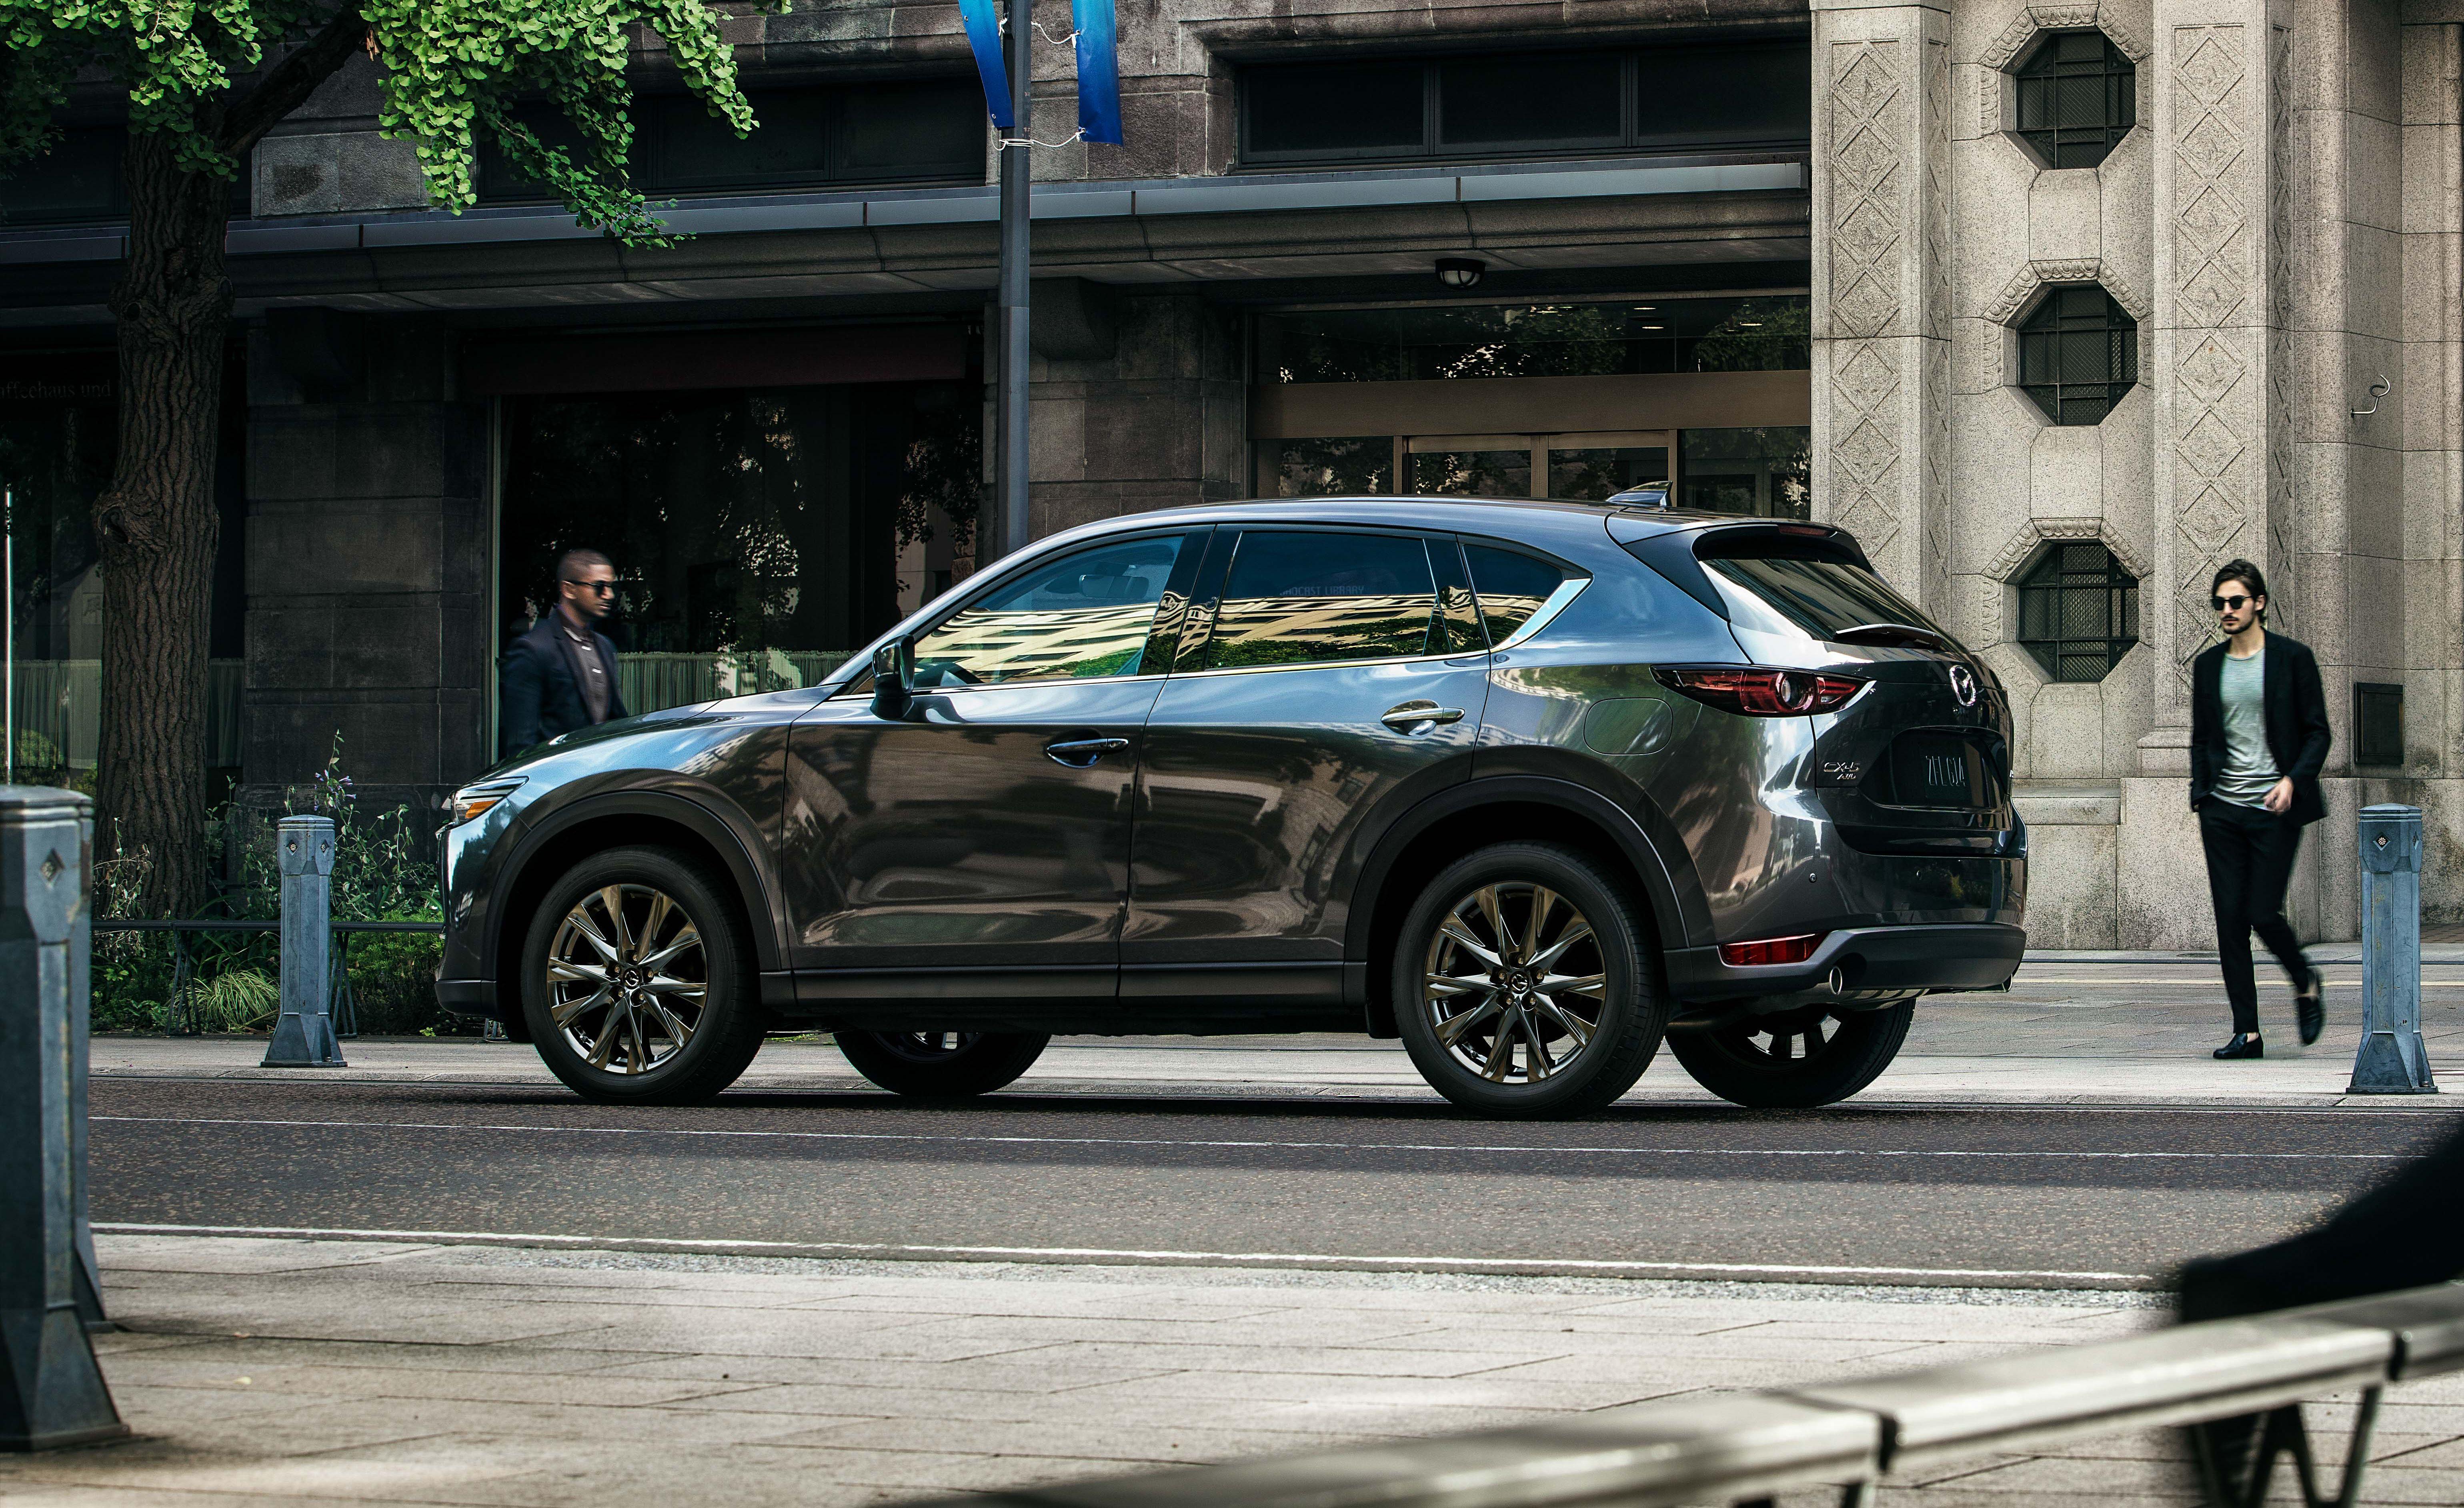 2019 Mazda Cx 5 Fuel Efficient Suv Mazda Suv